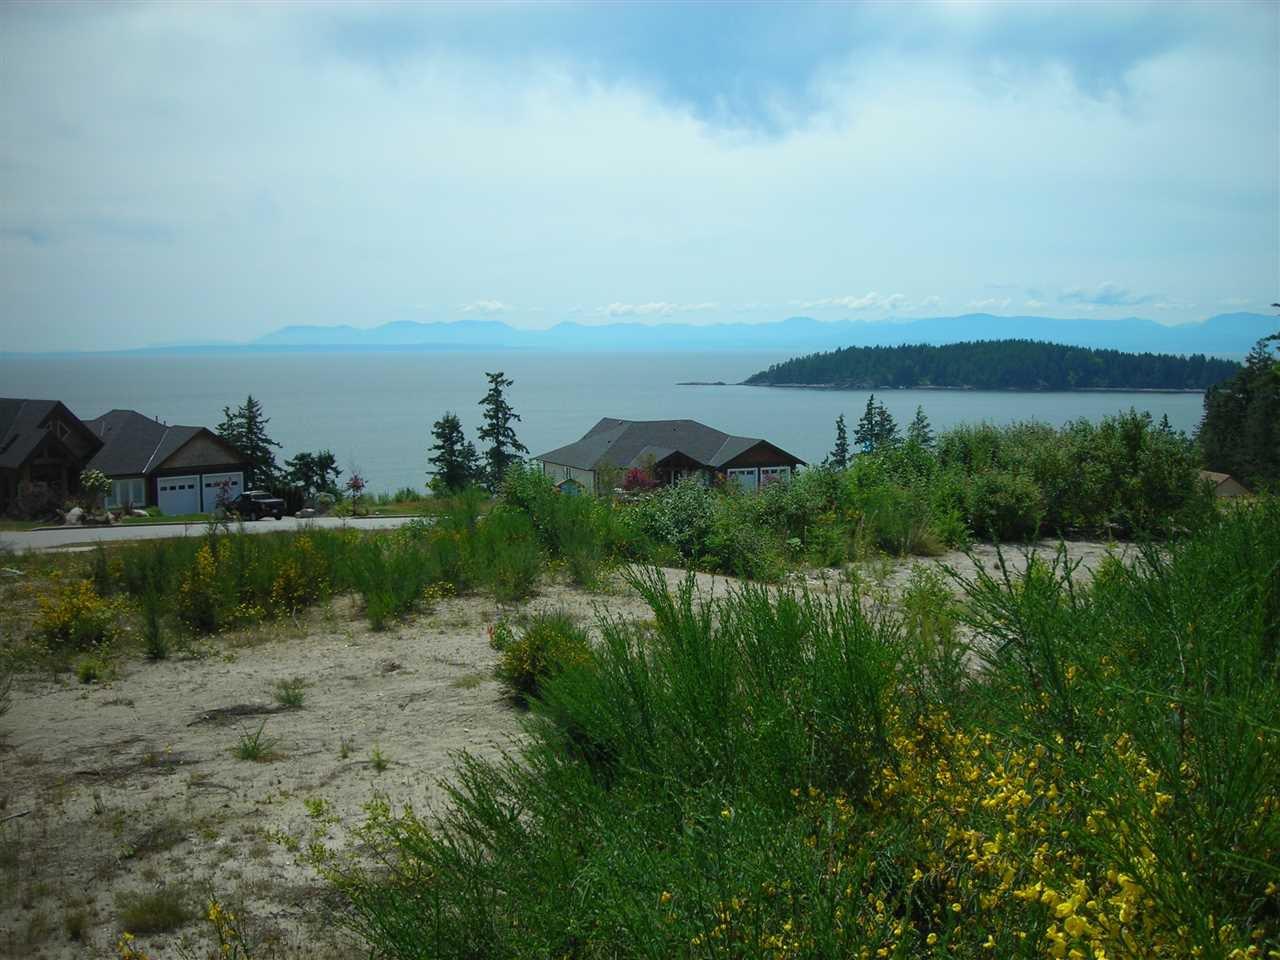 Main Photo: LOT 52 COMPASS LANE in Sechelt: Sechelt District Land for sale (Sunshine Coast)  : MLS®# R2042193